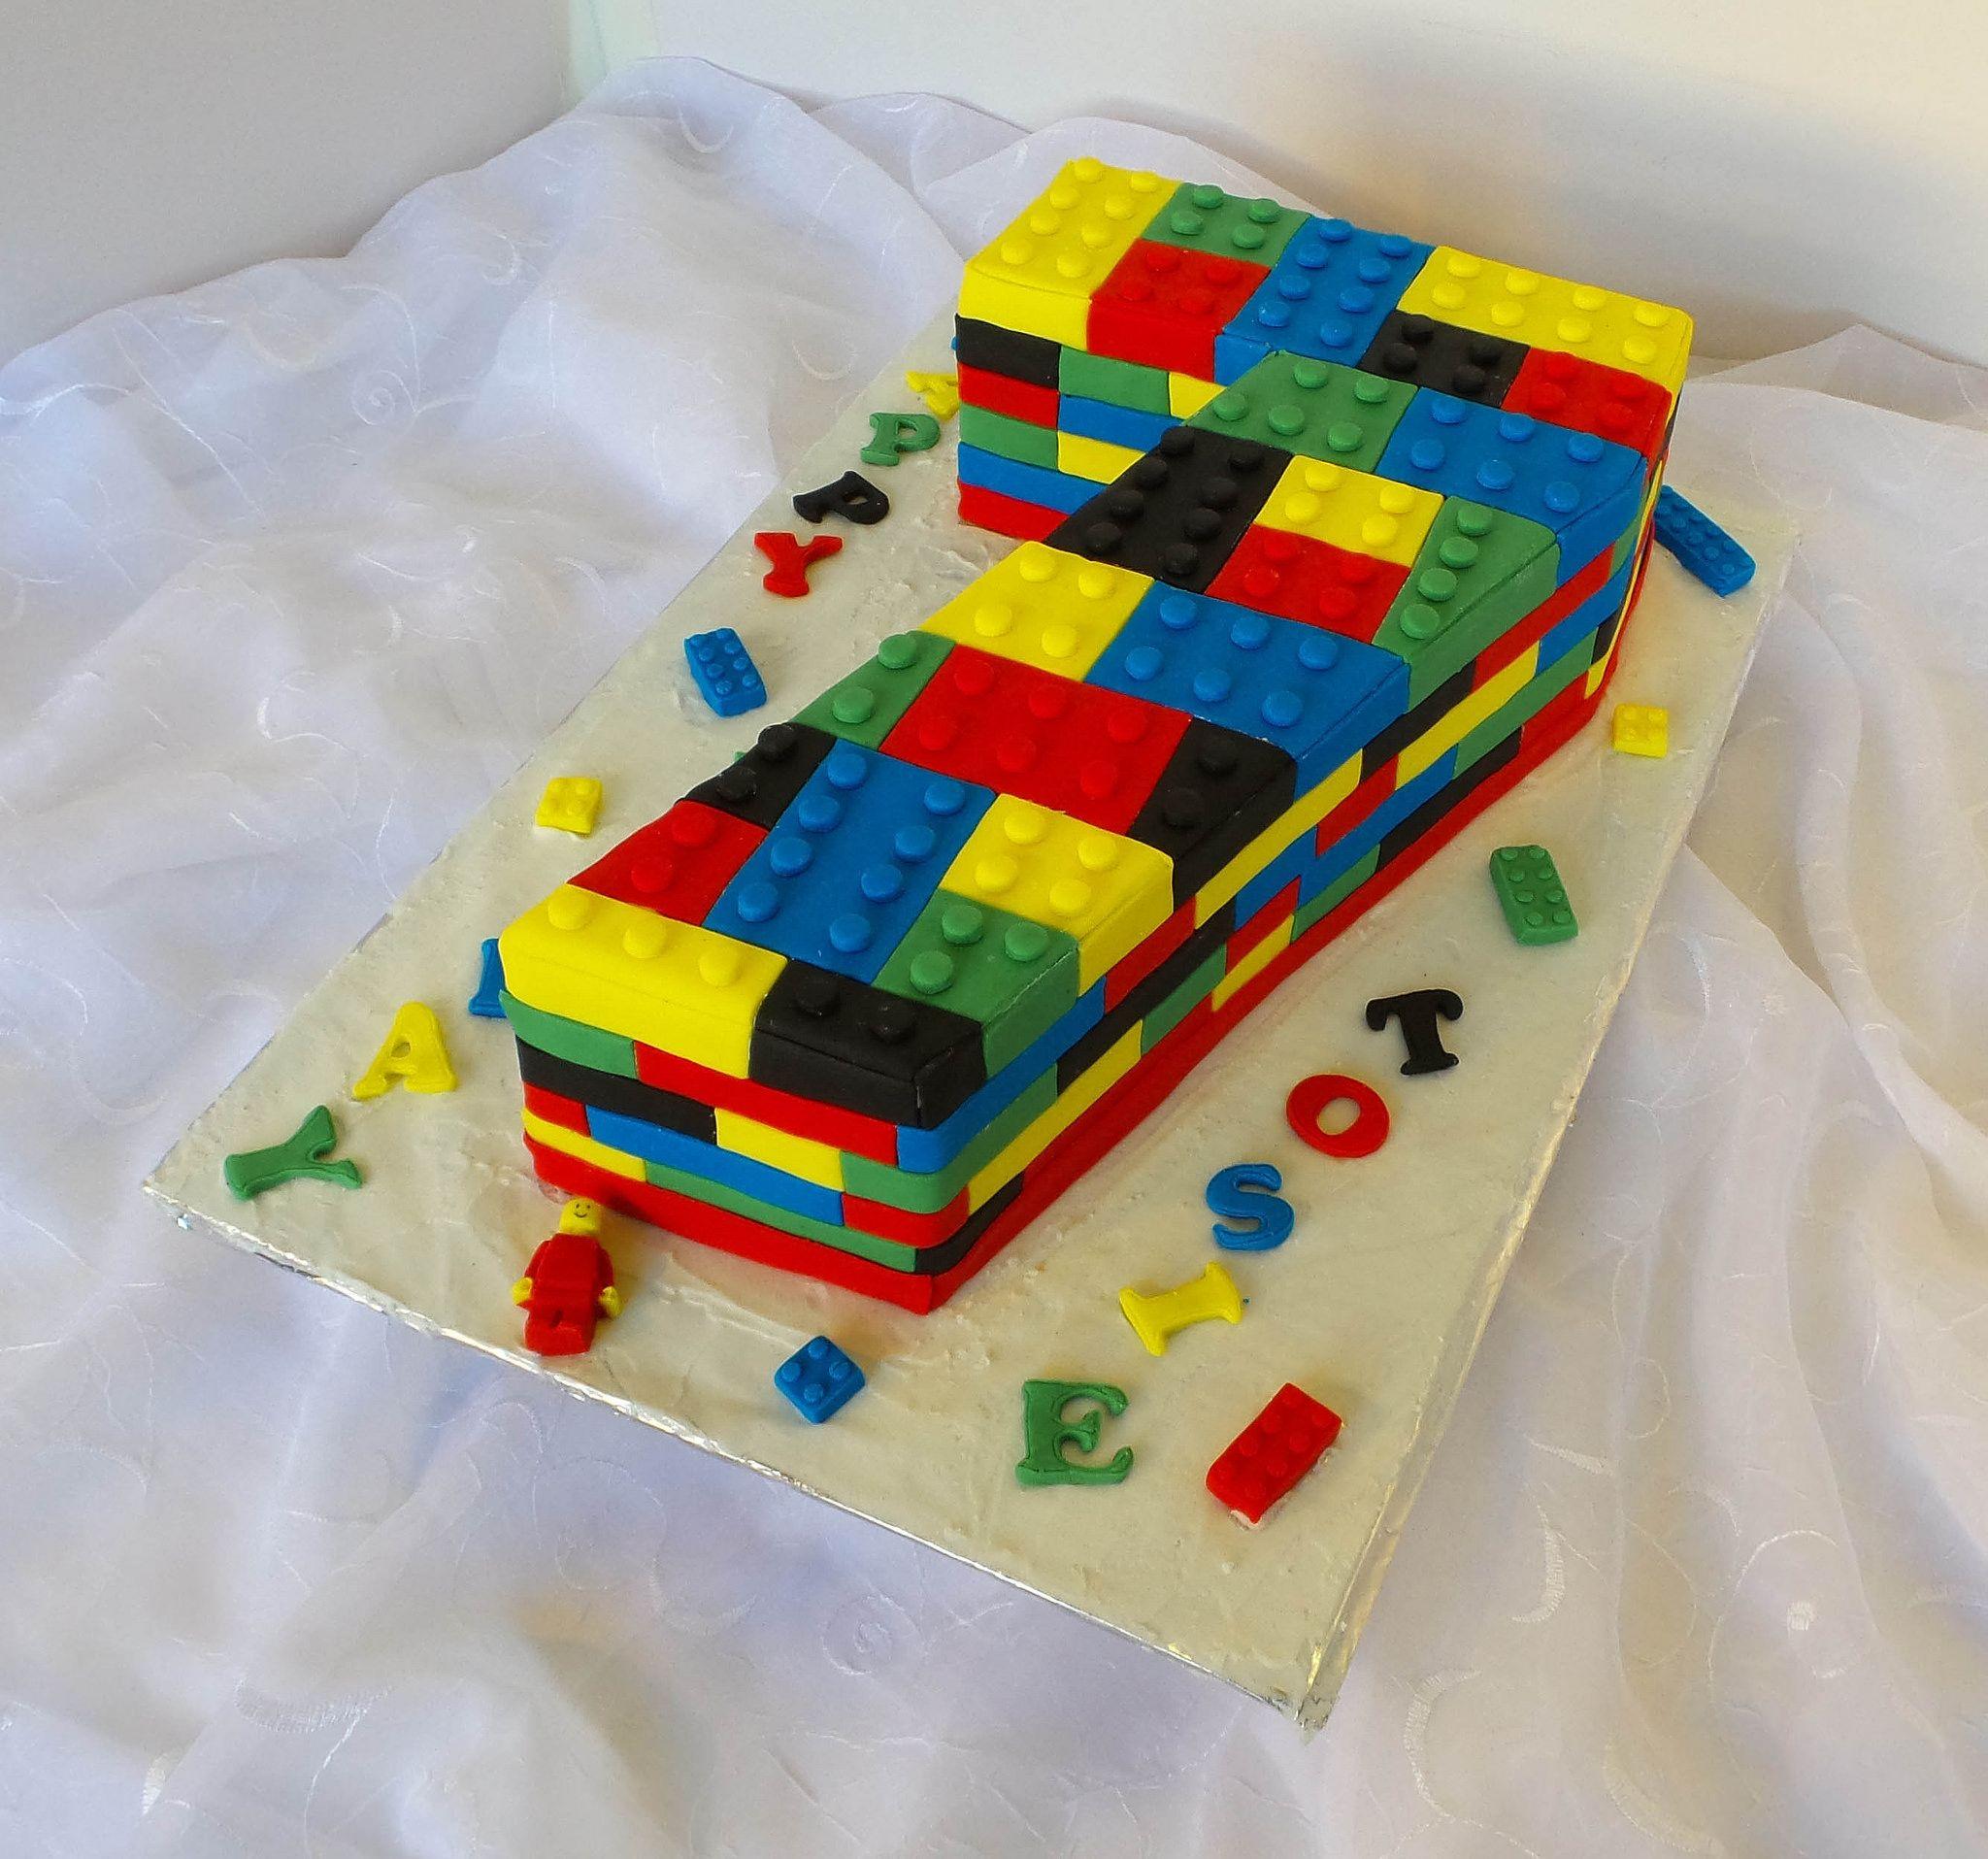 Pleasing Lego Themed Birthday Cake With Images Lego Birthday Cake Funny Birthday Cards Online Fluifree Goldxyz